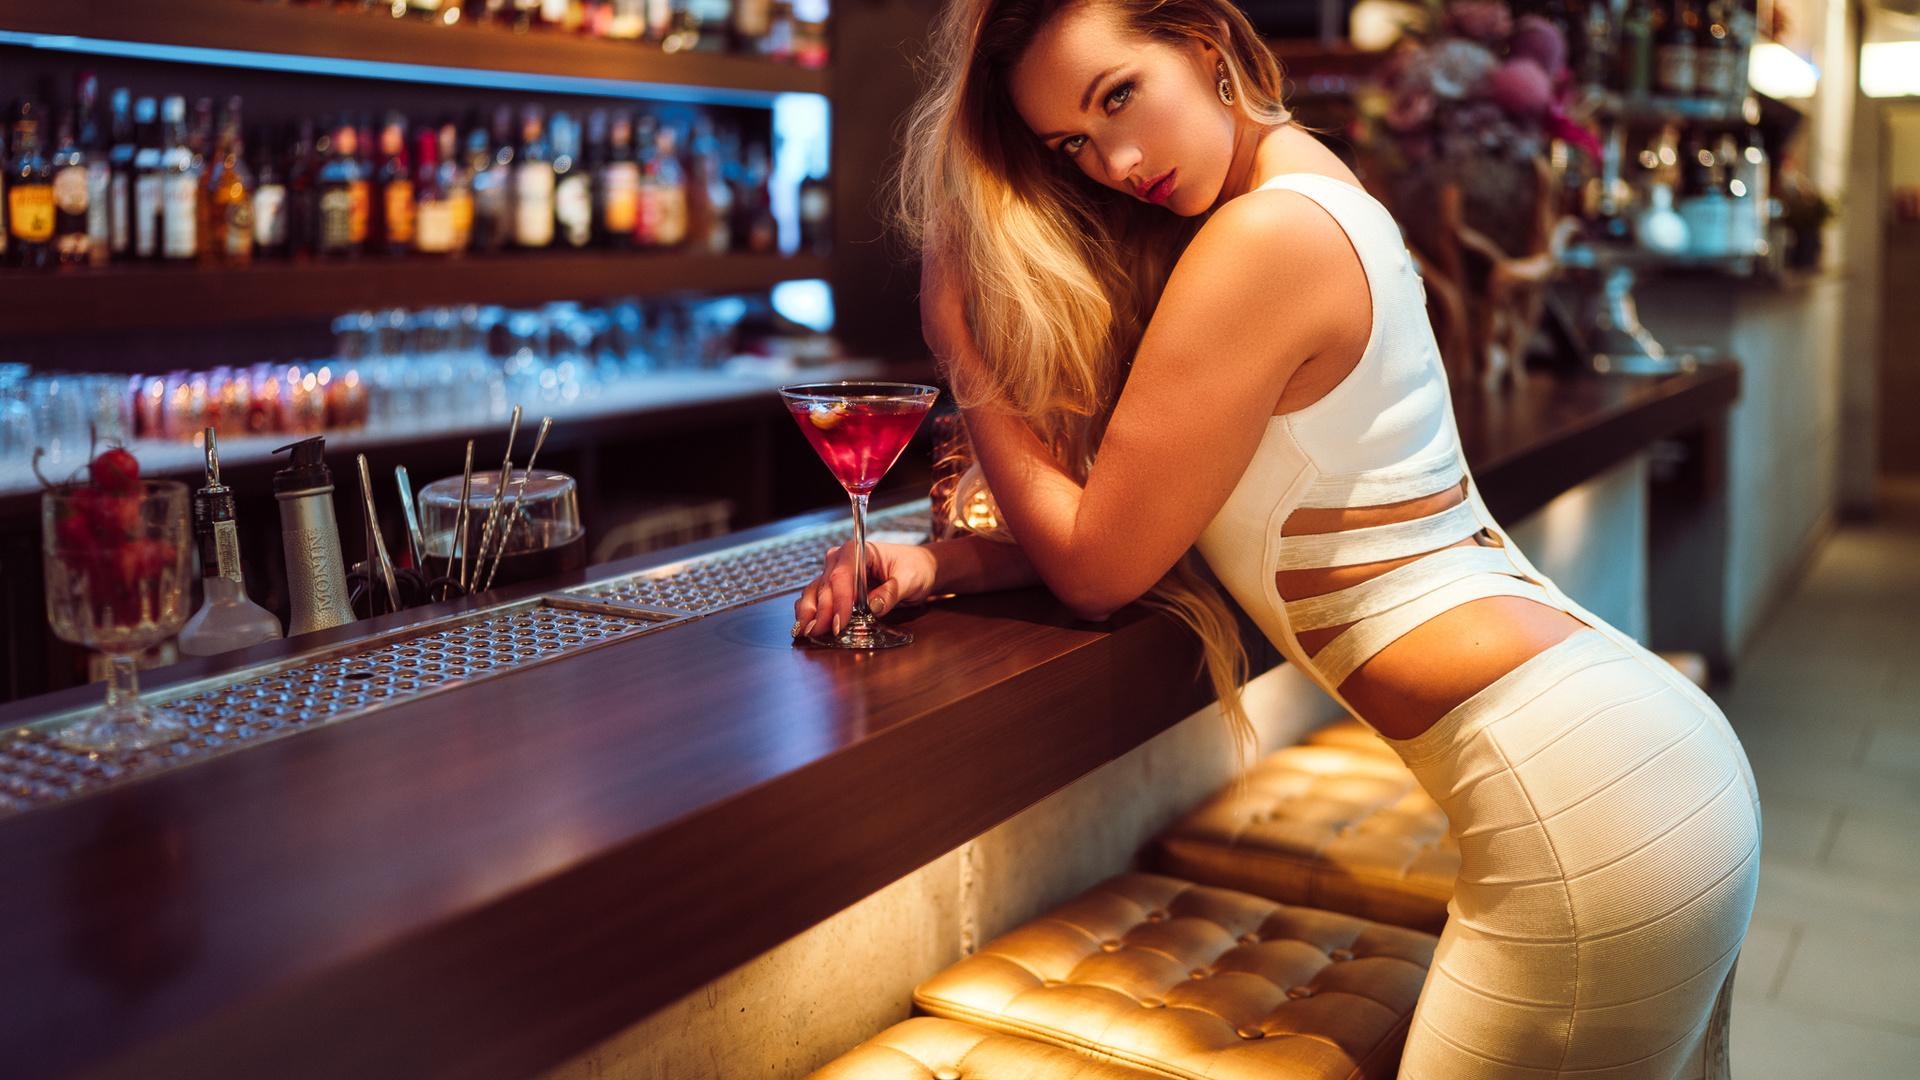 Стриптис на барной стойке, Эротика: стриптиз на барной стойке. Эскизы 1 фотография